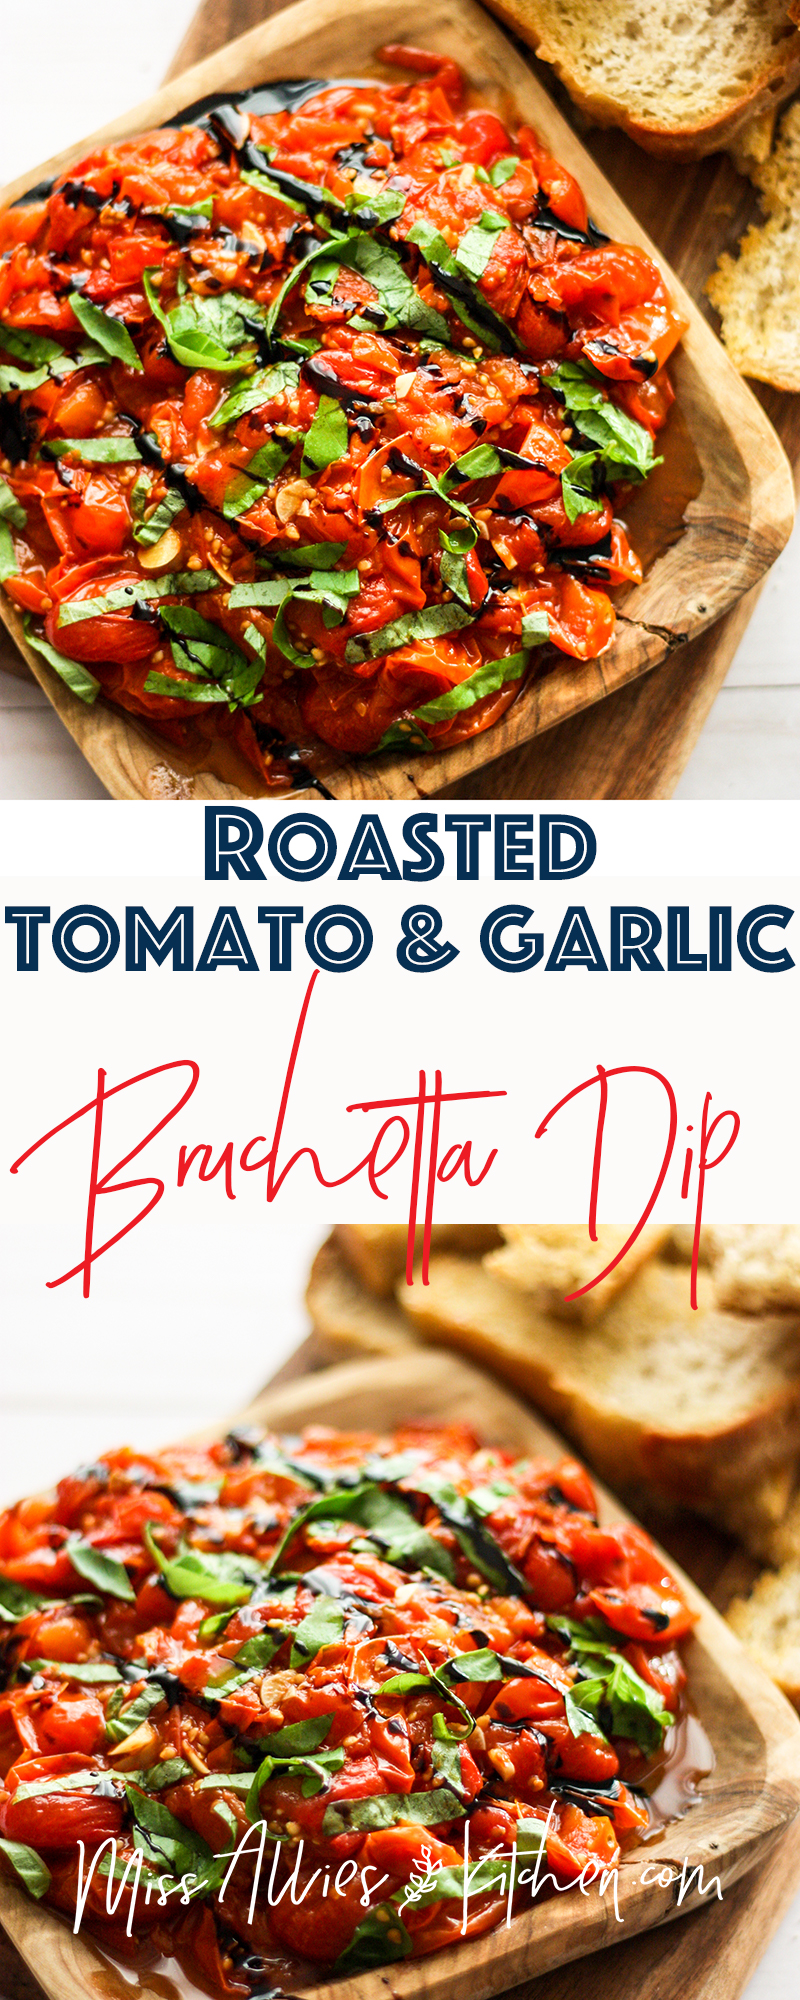 Roasted Tomato & Garlic Bruschetta Dip